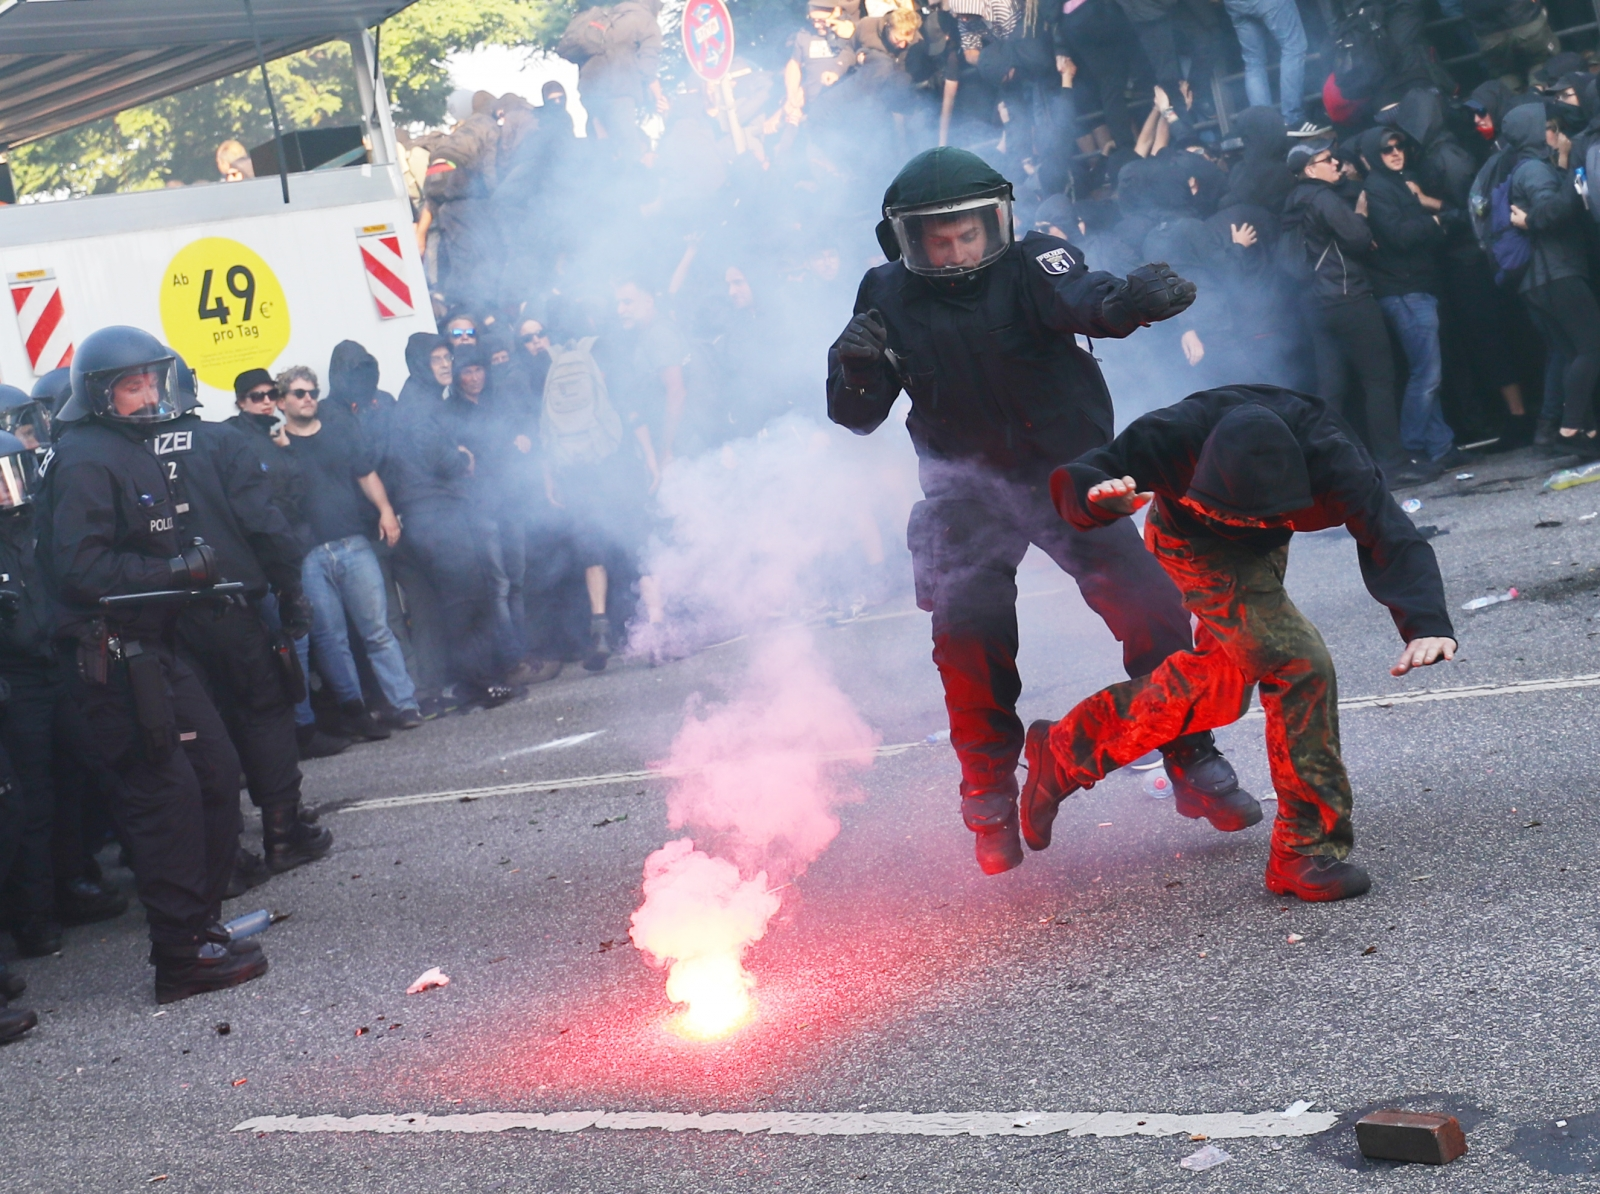 Riots police at G20 protests in Hamburg